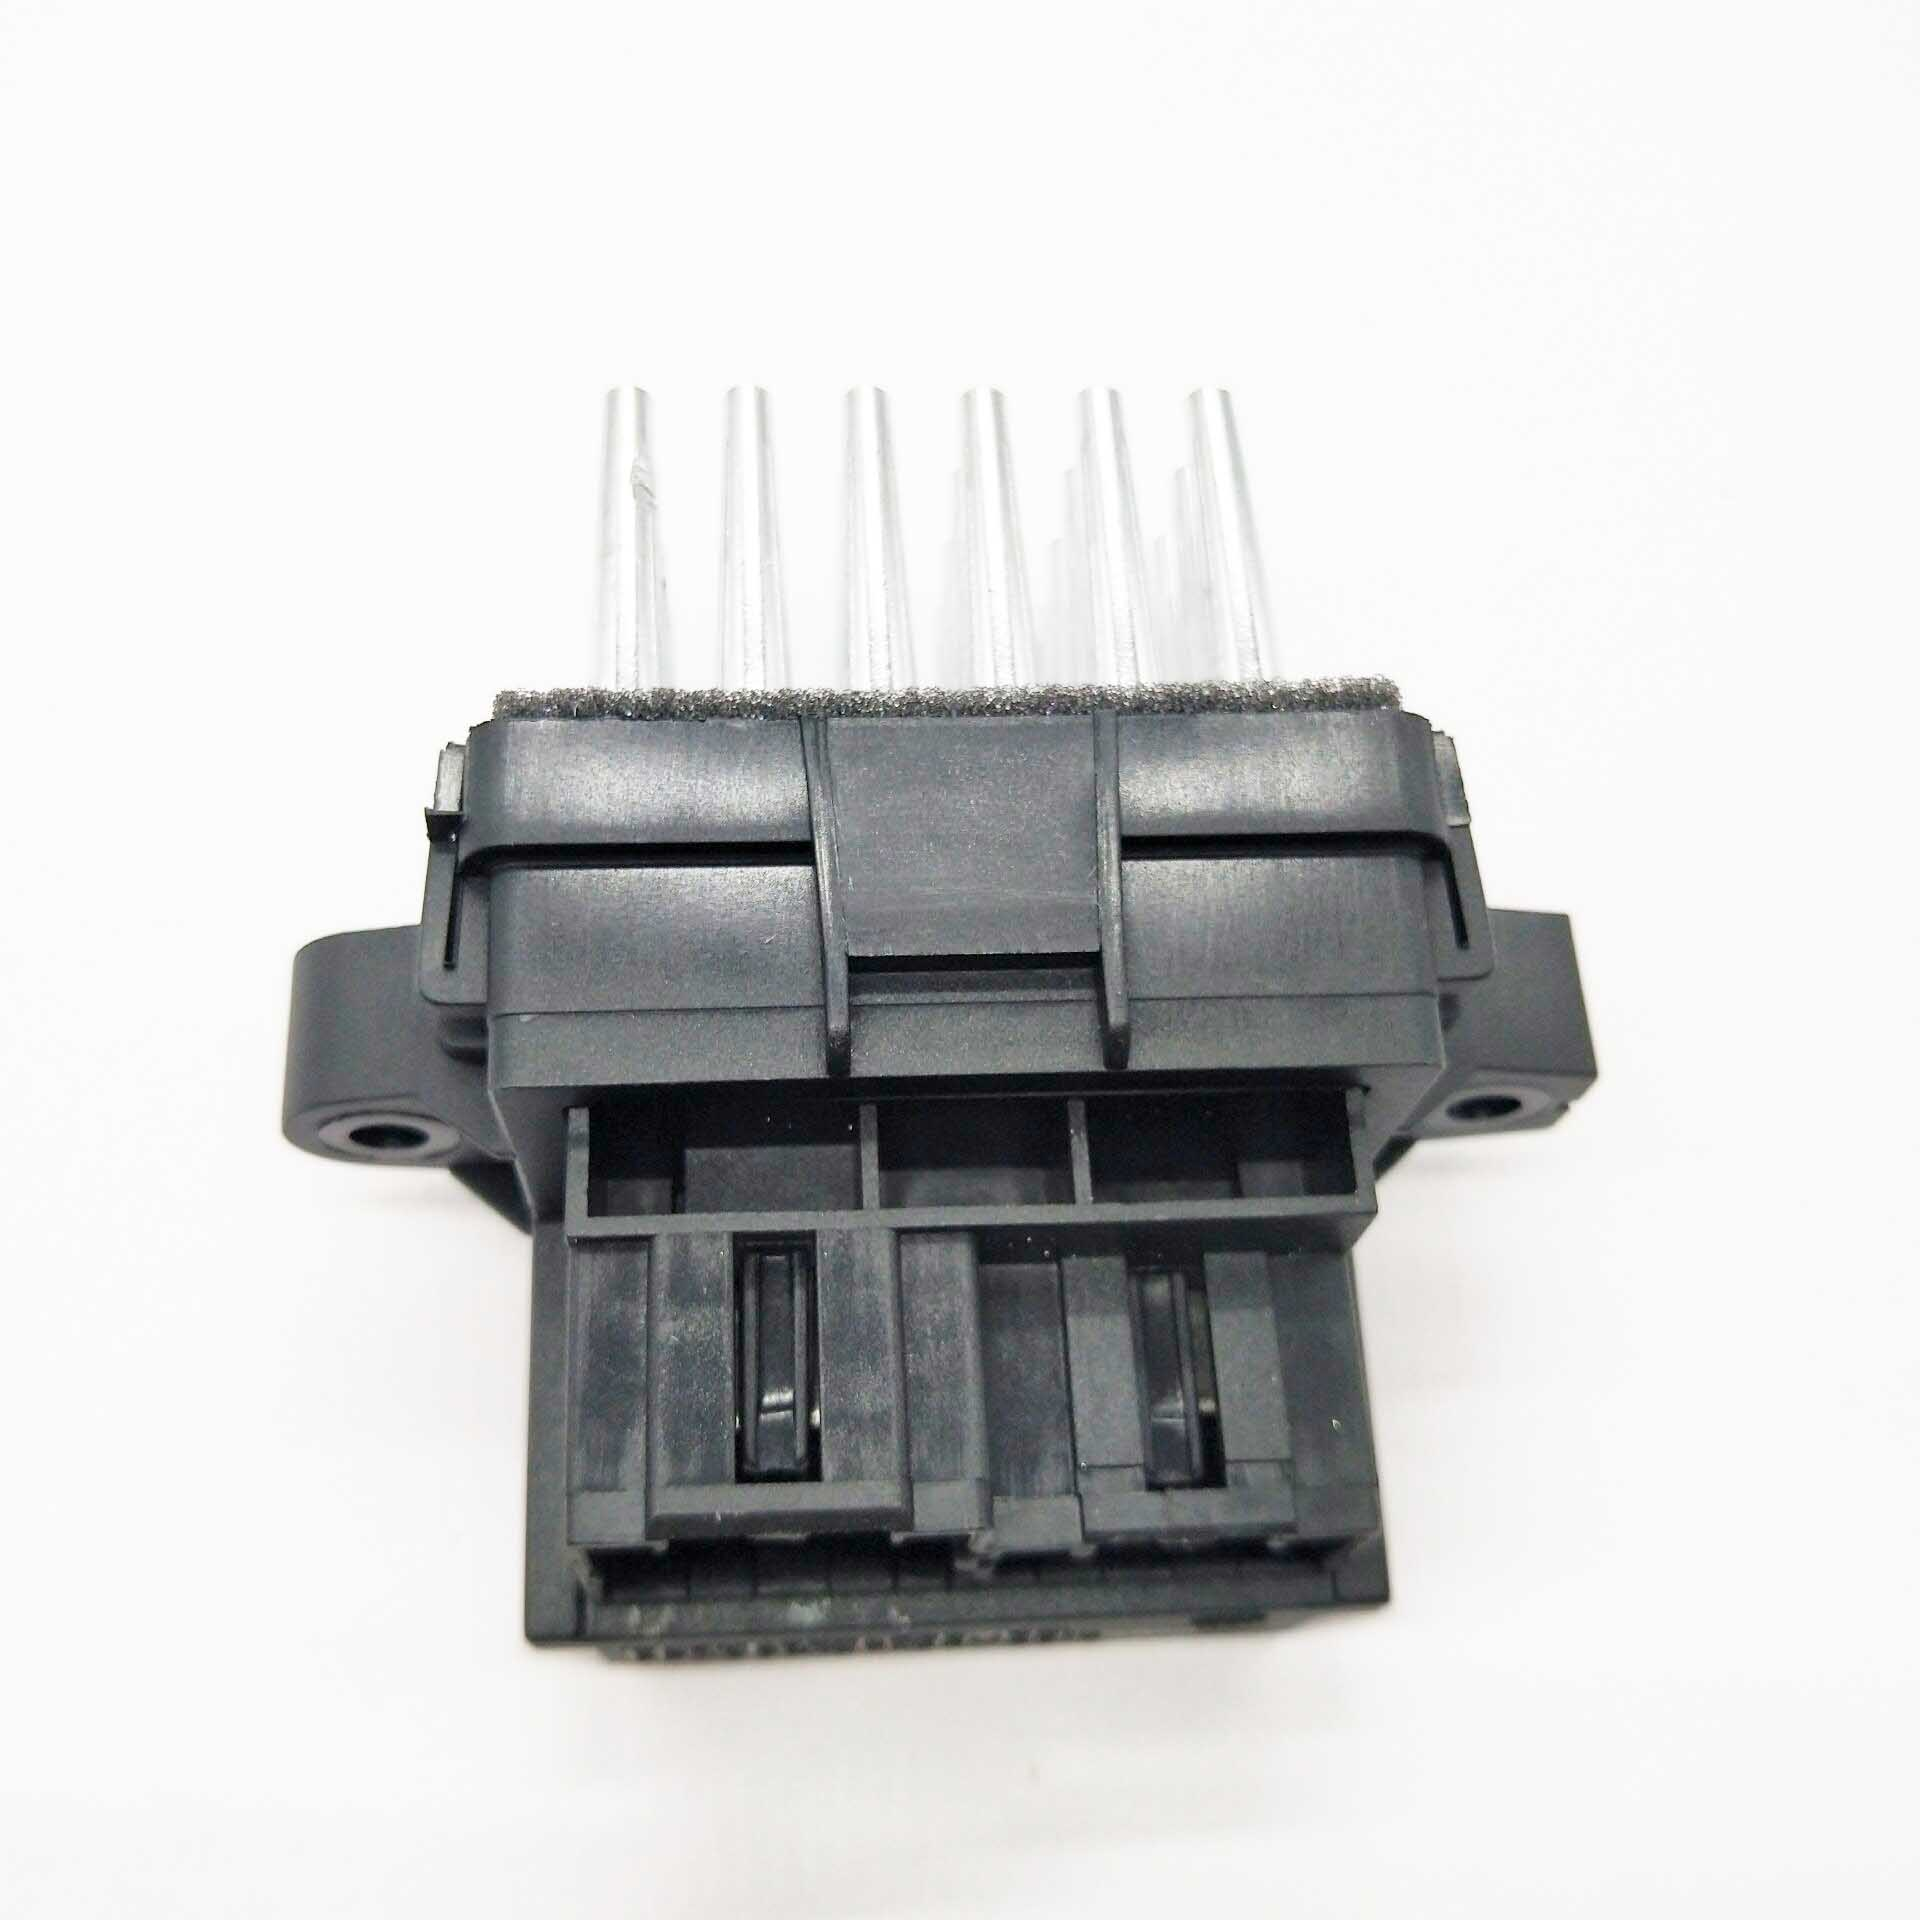 Blower Motor Module Resistor For Chevrolet Silverado Cadillac GMC Cadillac Vue